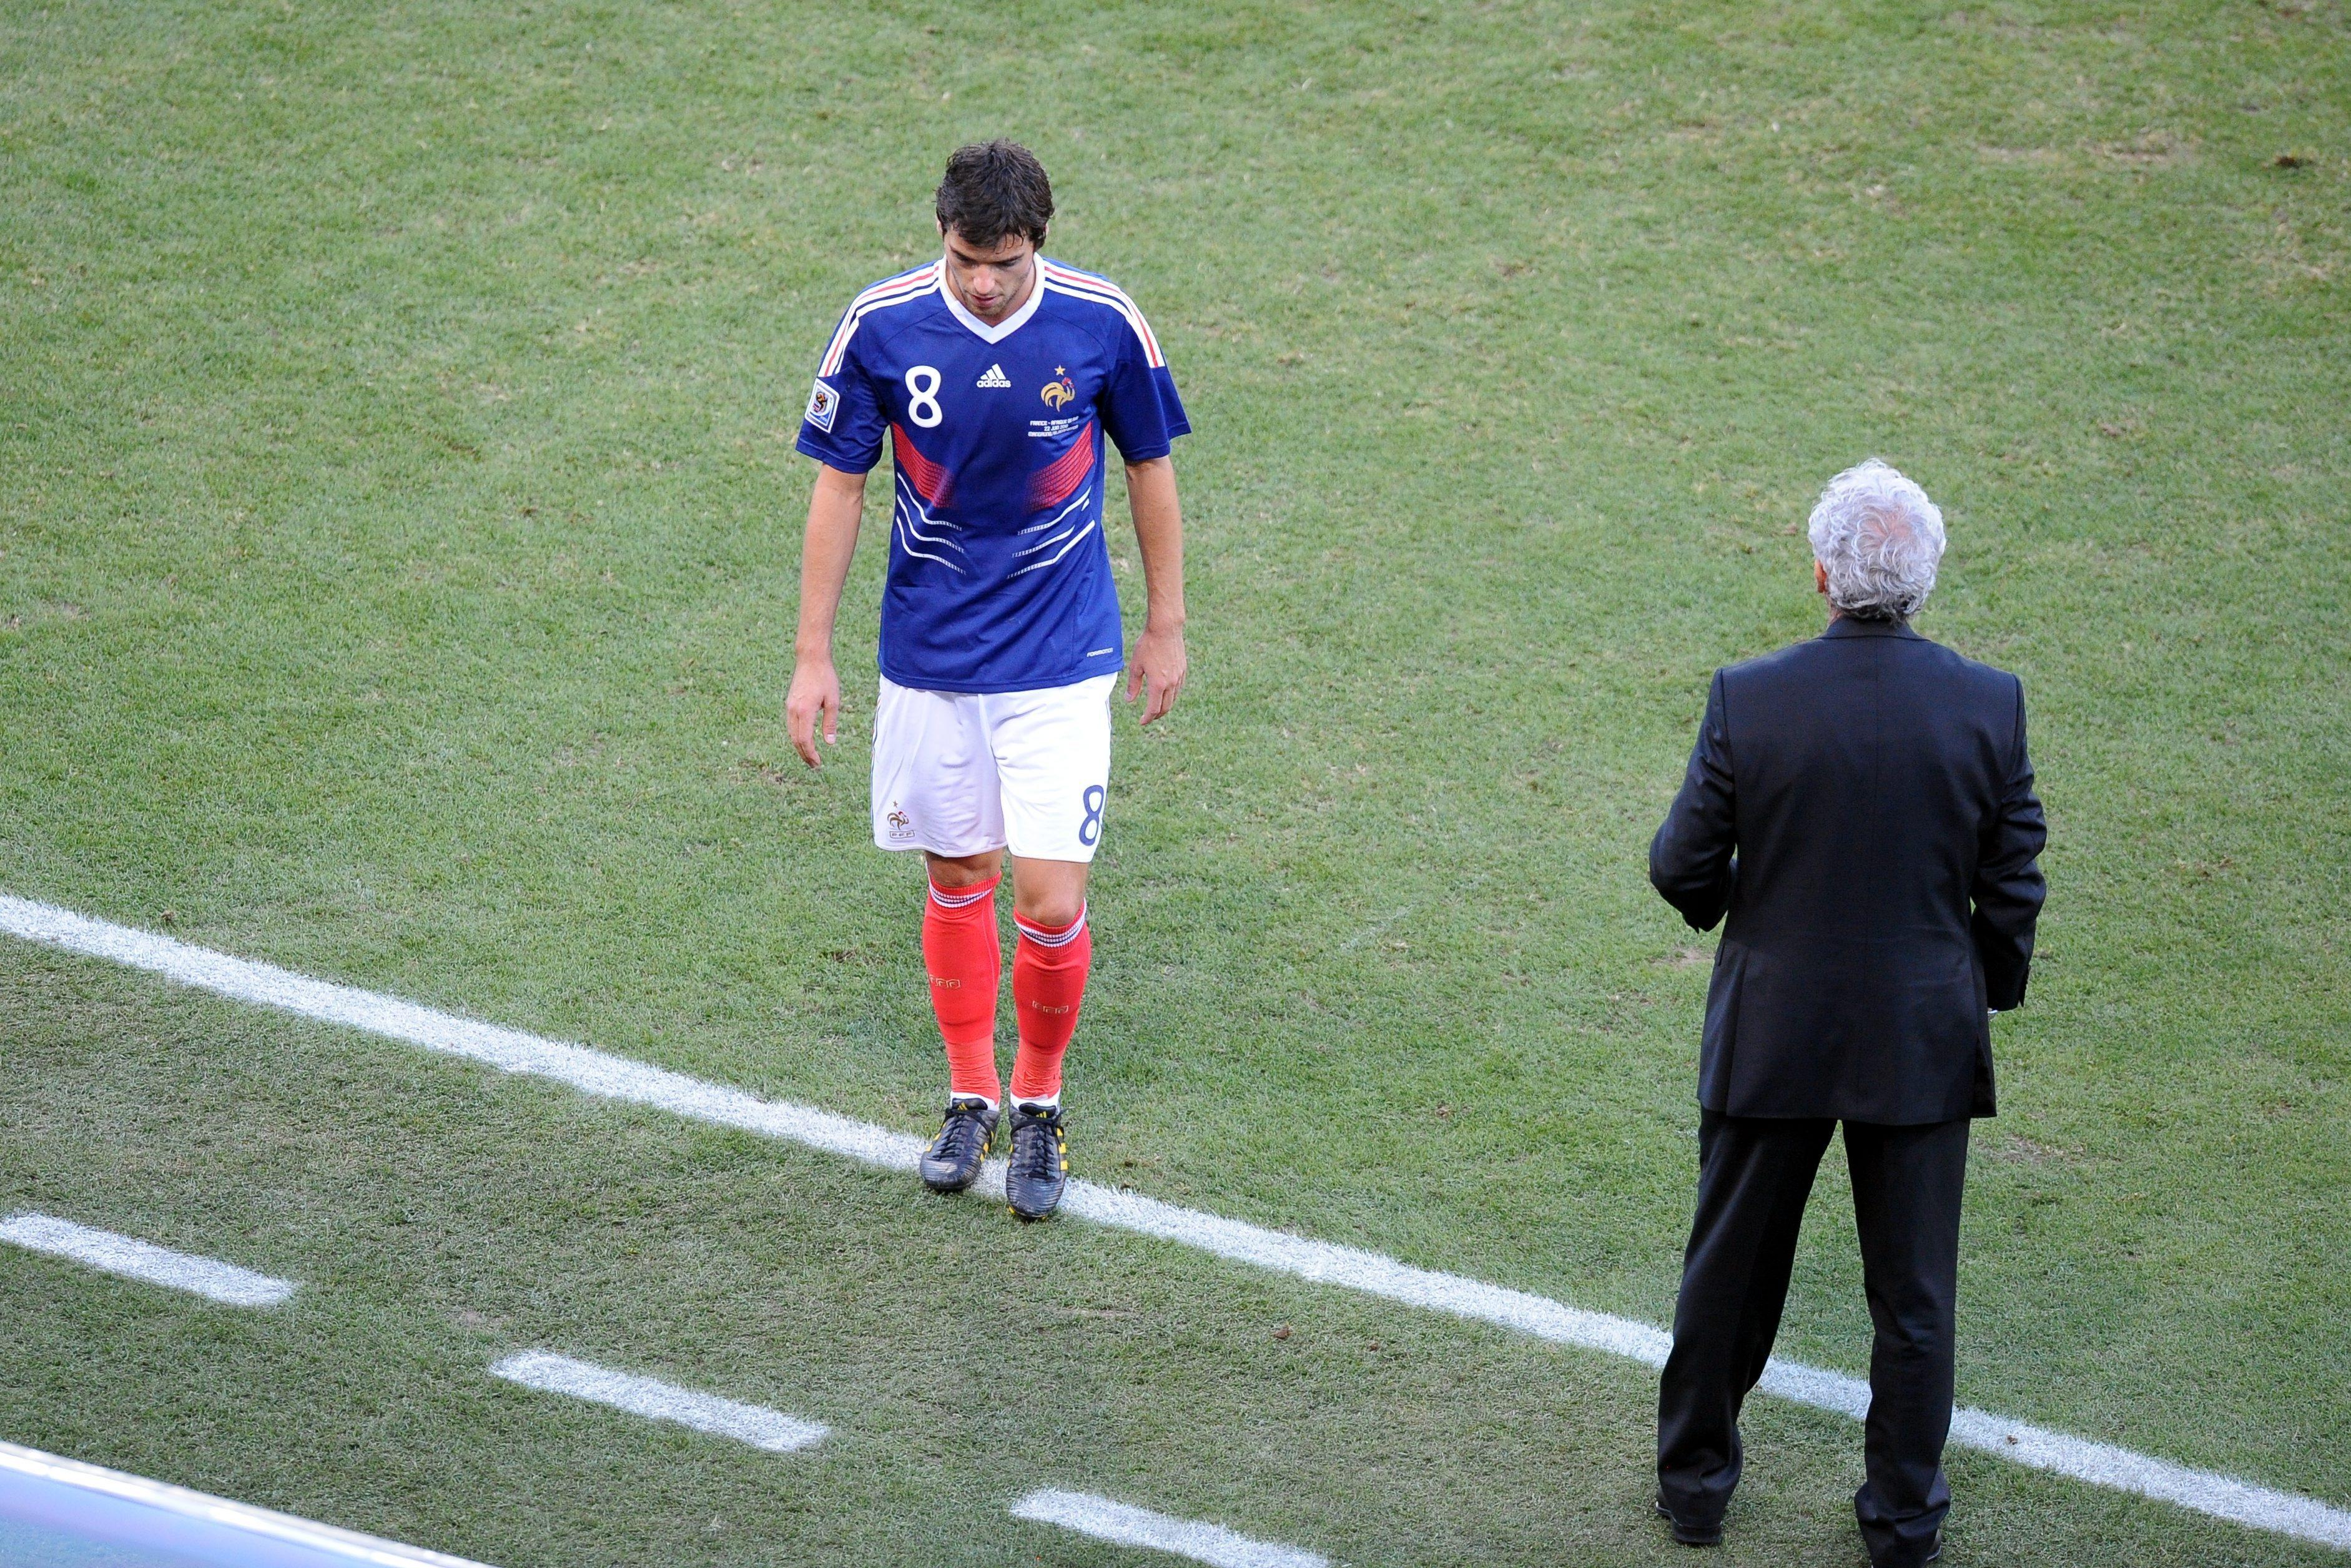 Football - Equipe de France - Gourcuff victime de «racisme anti-blanc» à Knysna ?